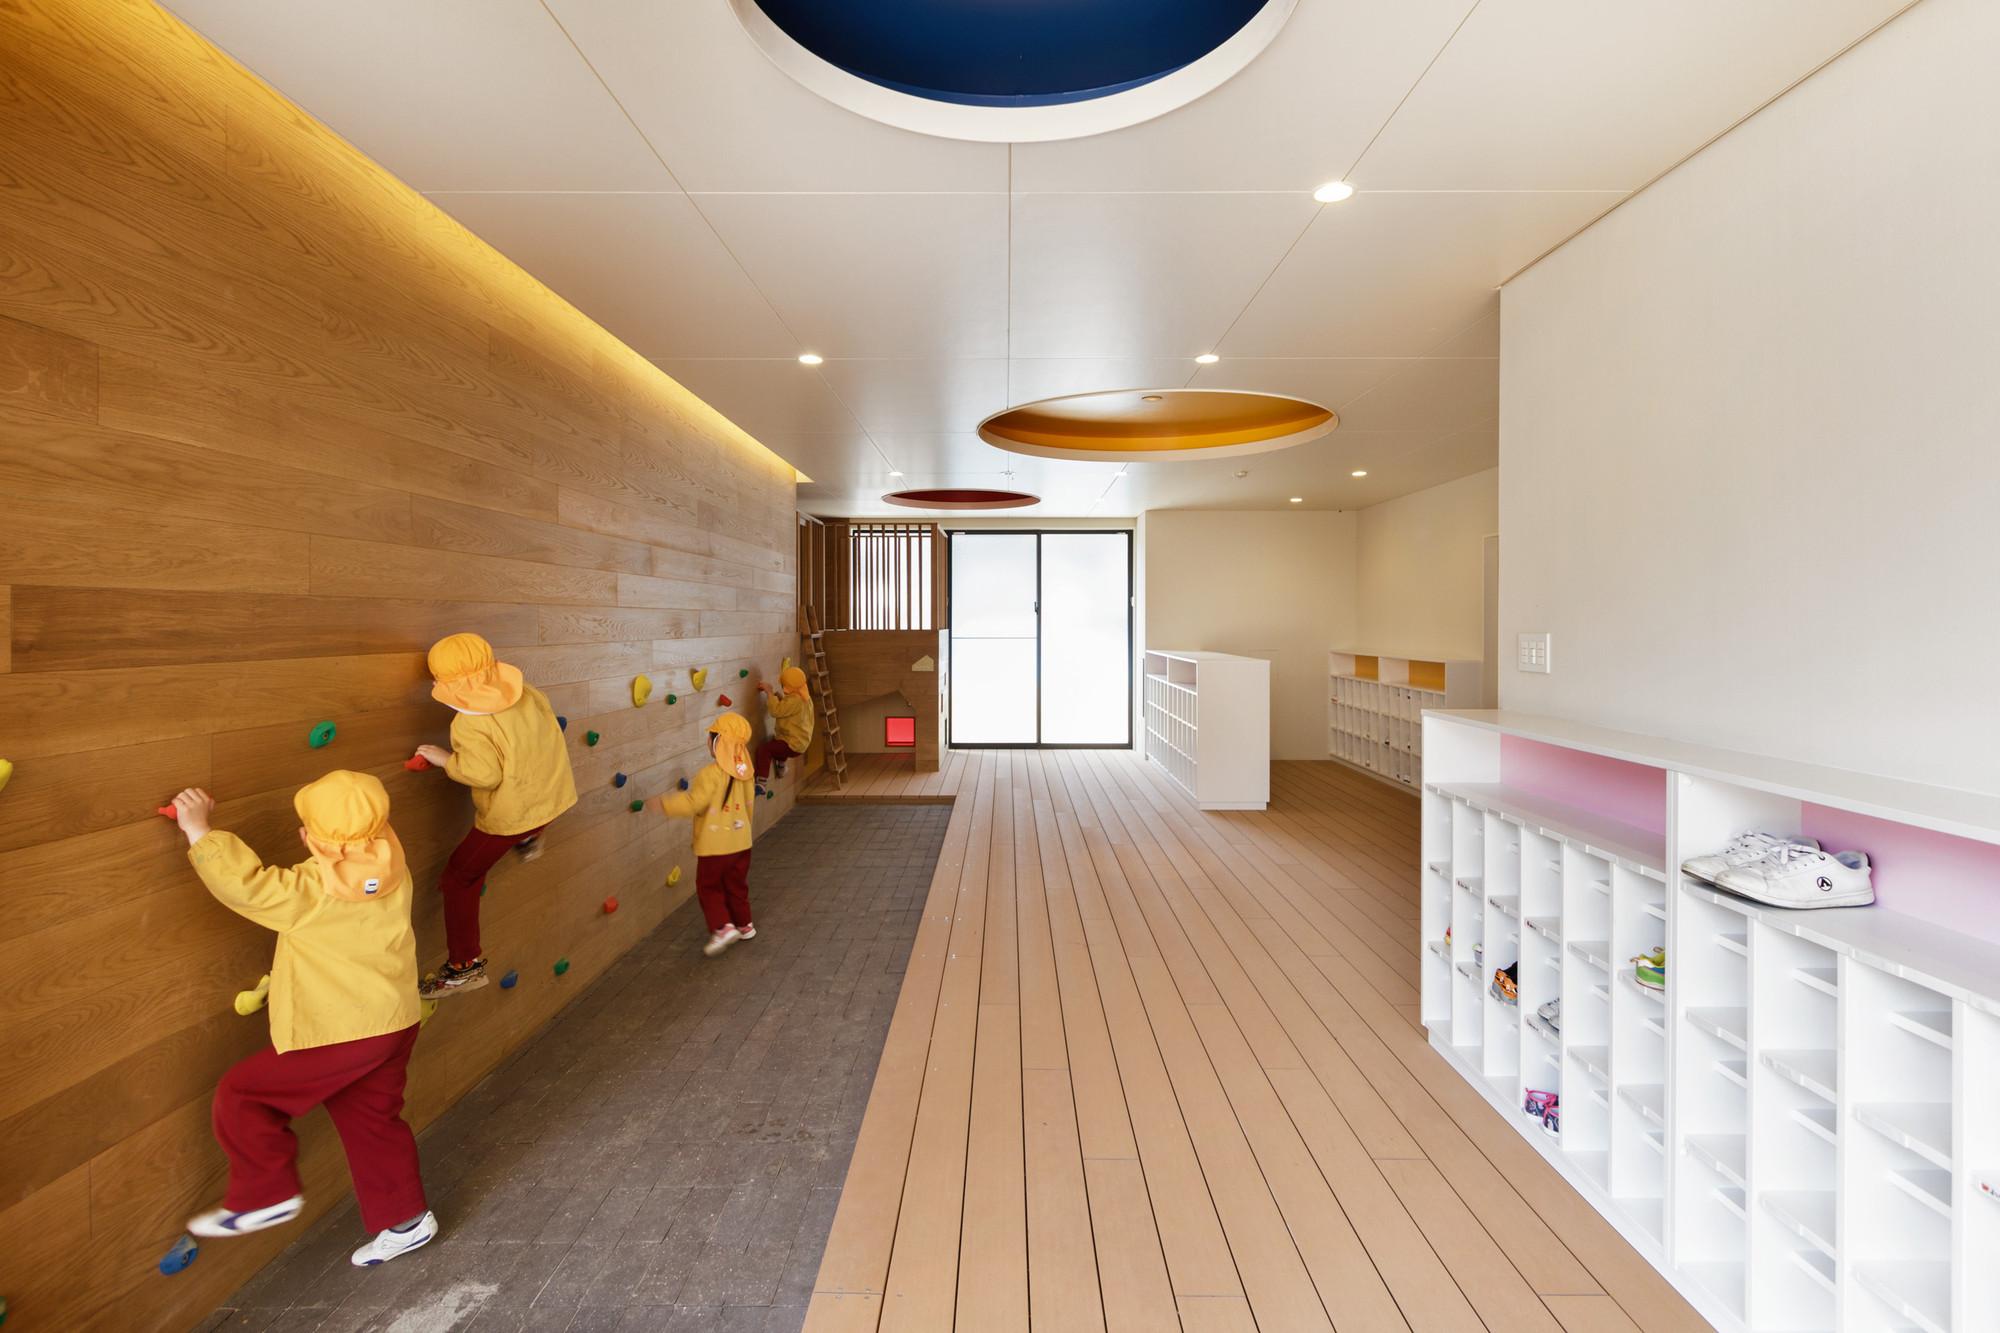 Jardín Infantil y Guardería C.O / HIBINOSEKKEI + Youji no Shiro, © Studio Bauhaus, Ryuji Ino